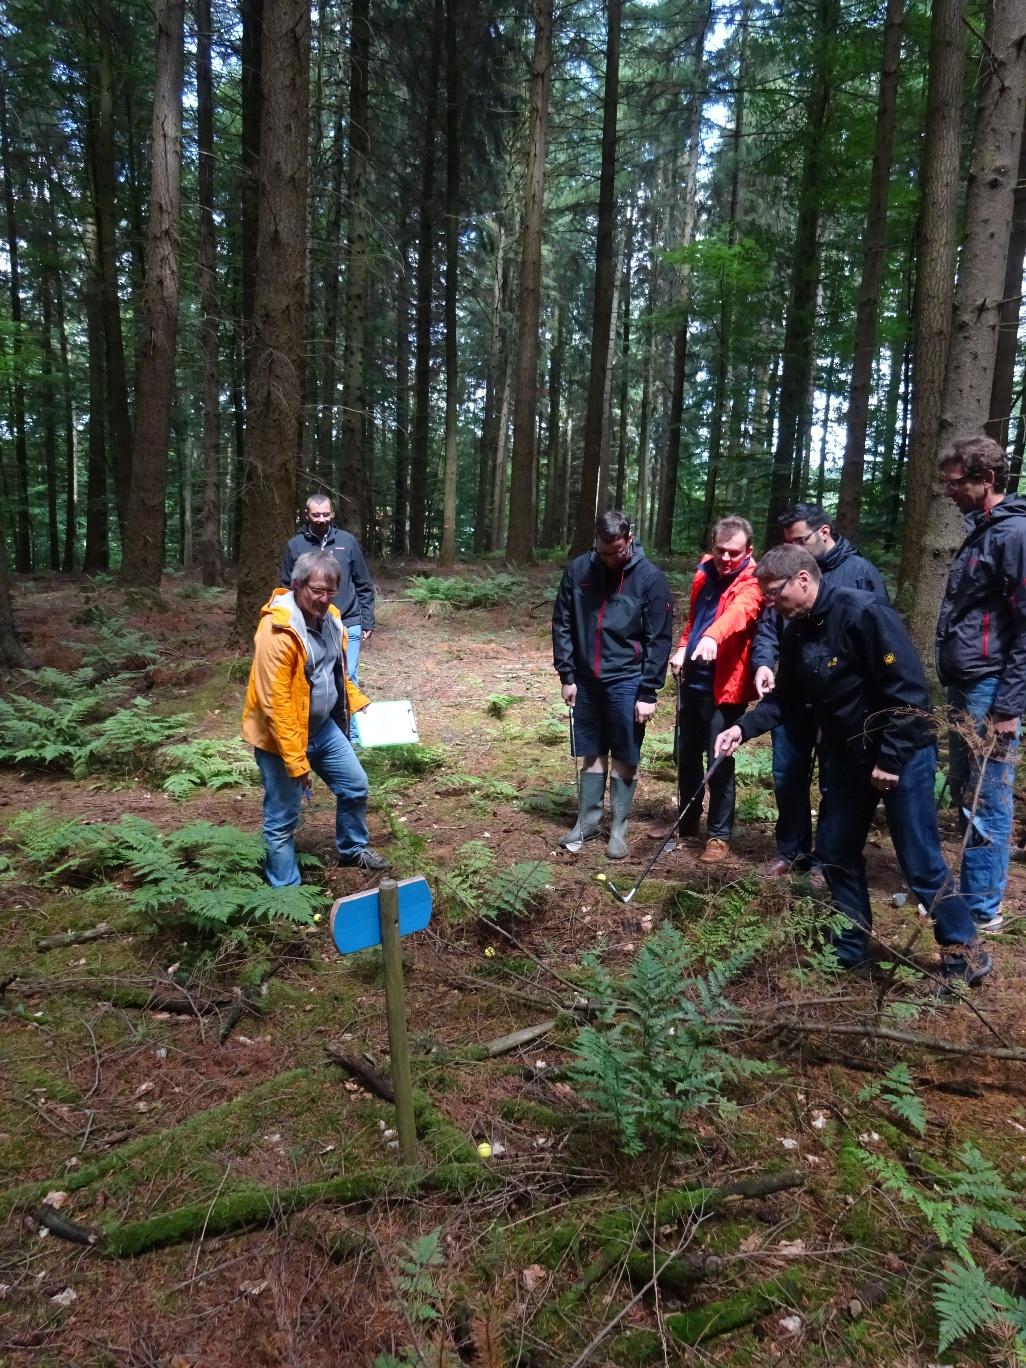 Crossgolf Kletterpark Teambuilding Firmenevent